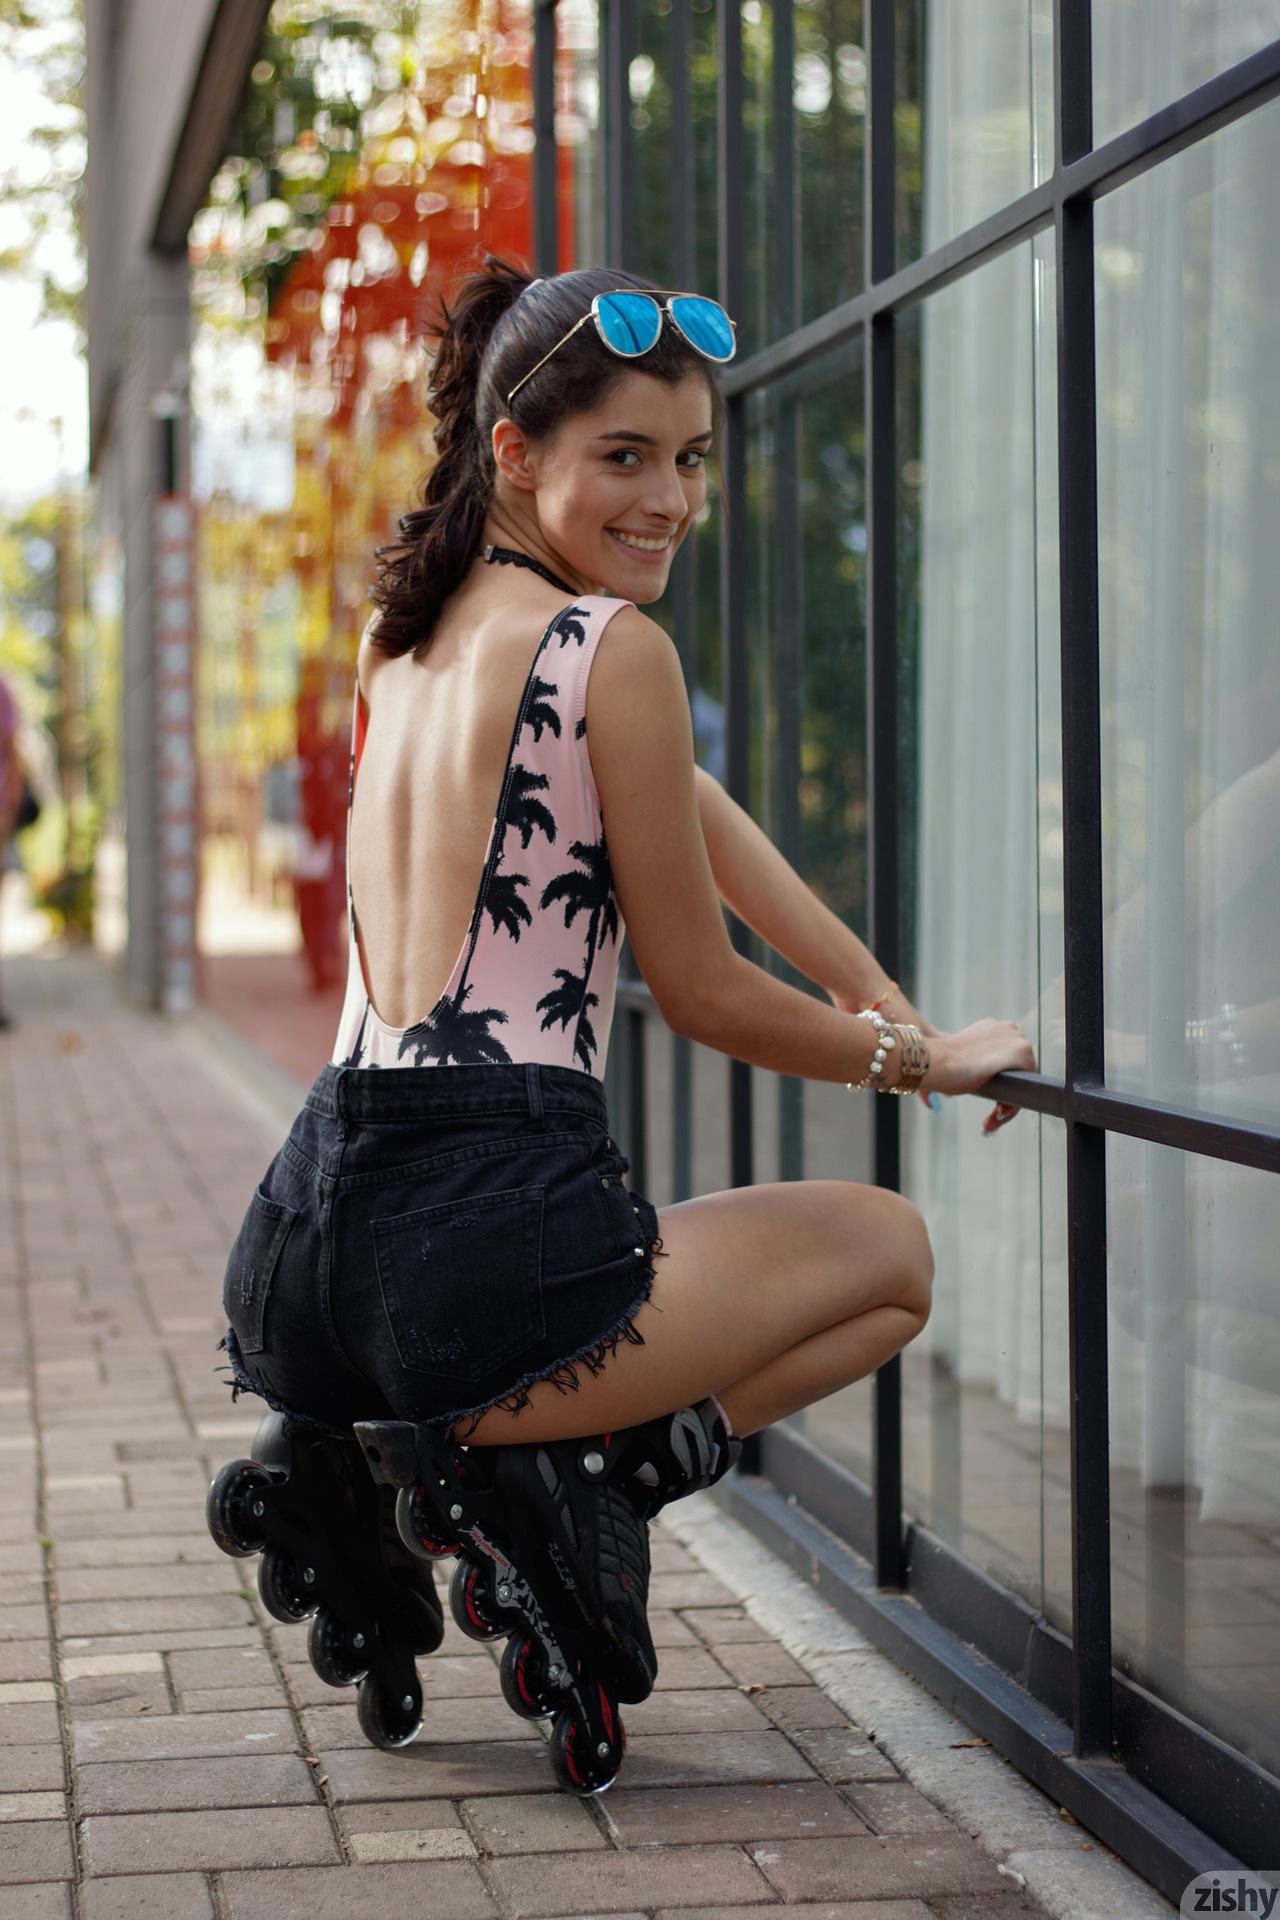 Kate Maze Skates Colombia Zishy (24)